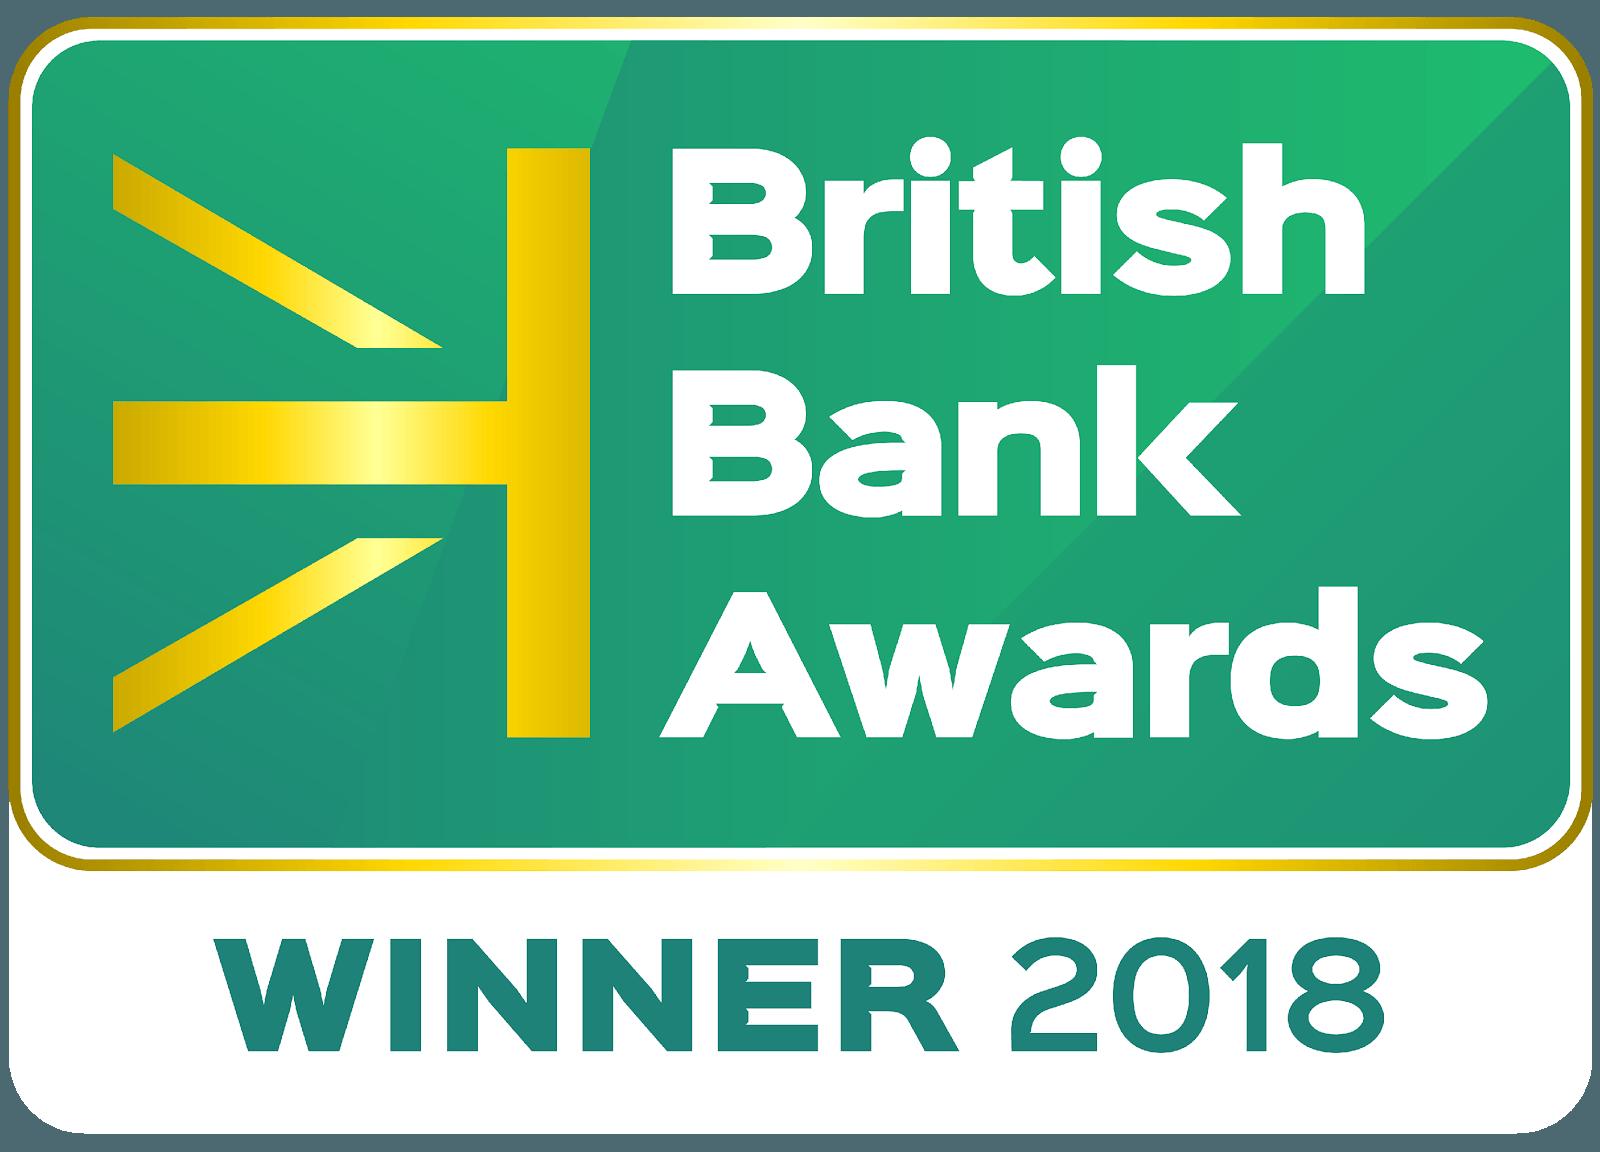 British Bank Awards